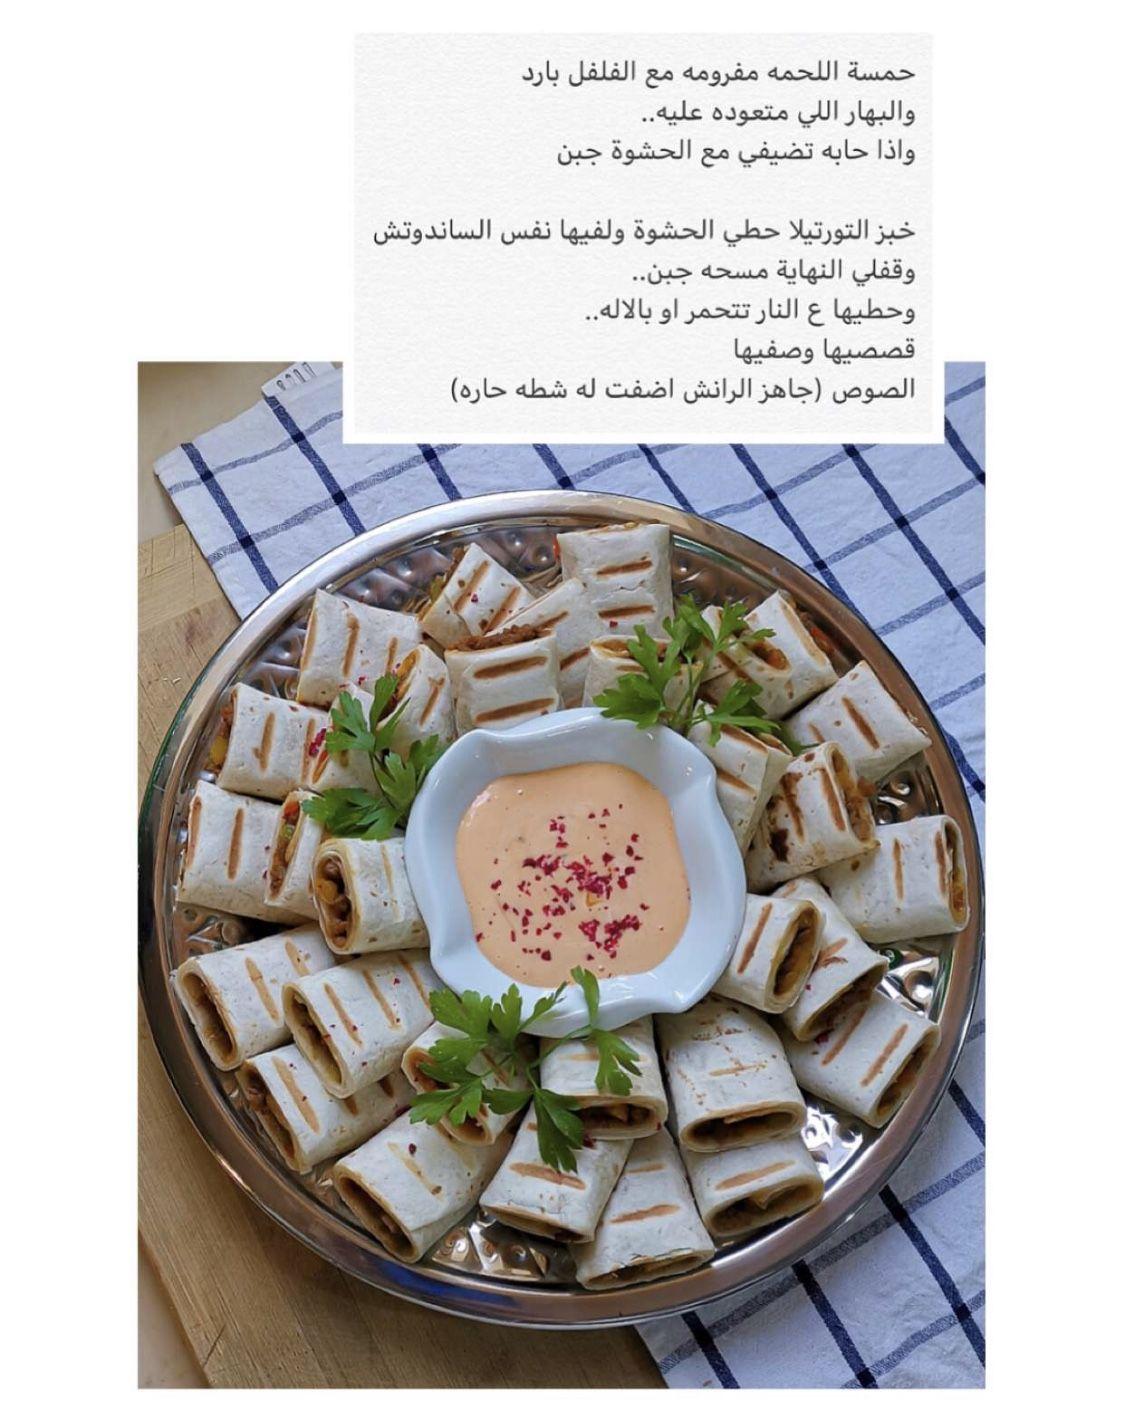 Pin By Shomok On وصفات مالح Arabic Food Food Recipes